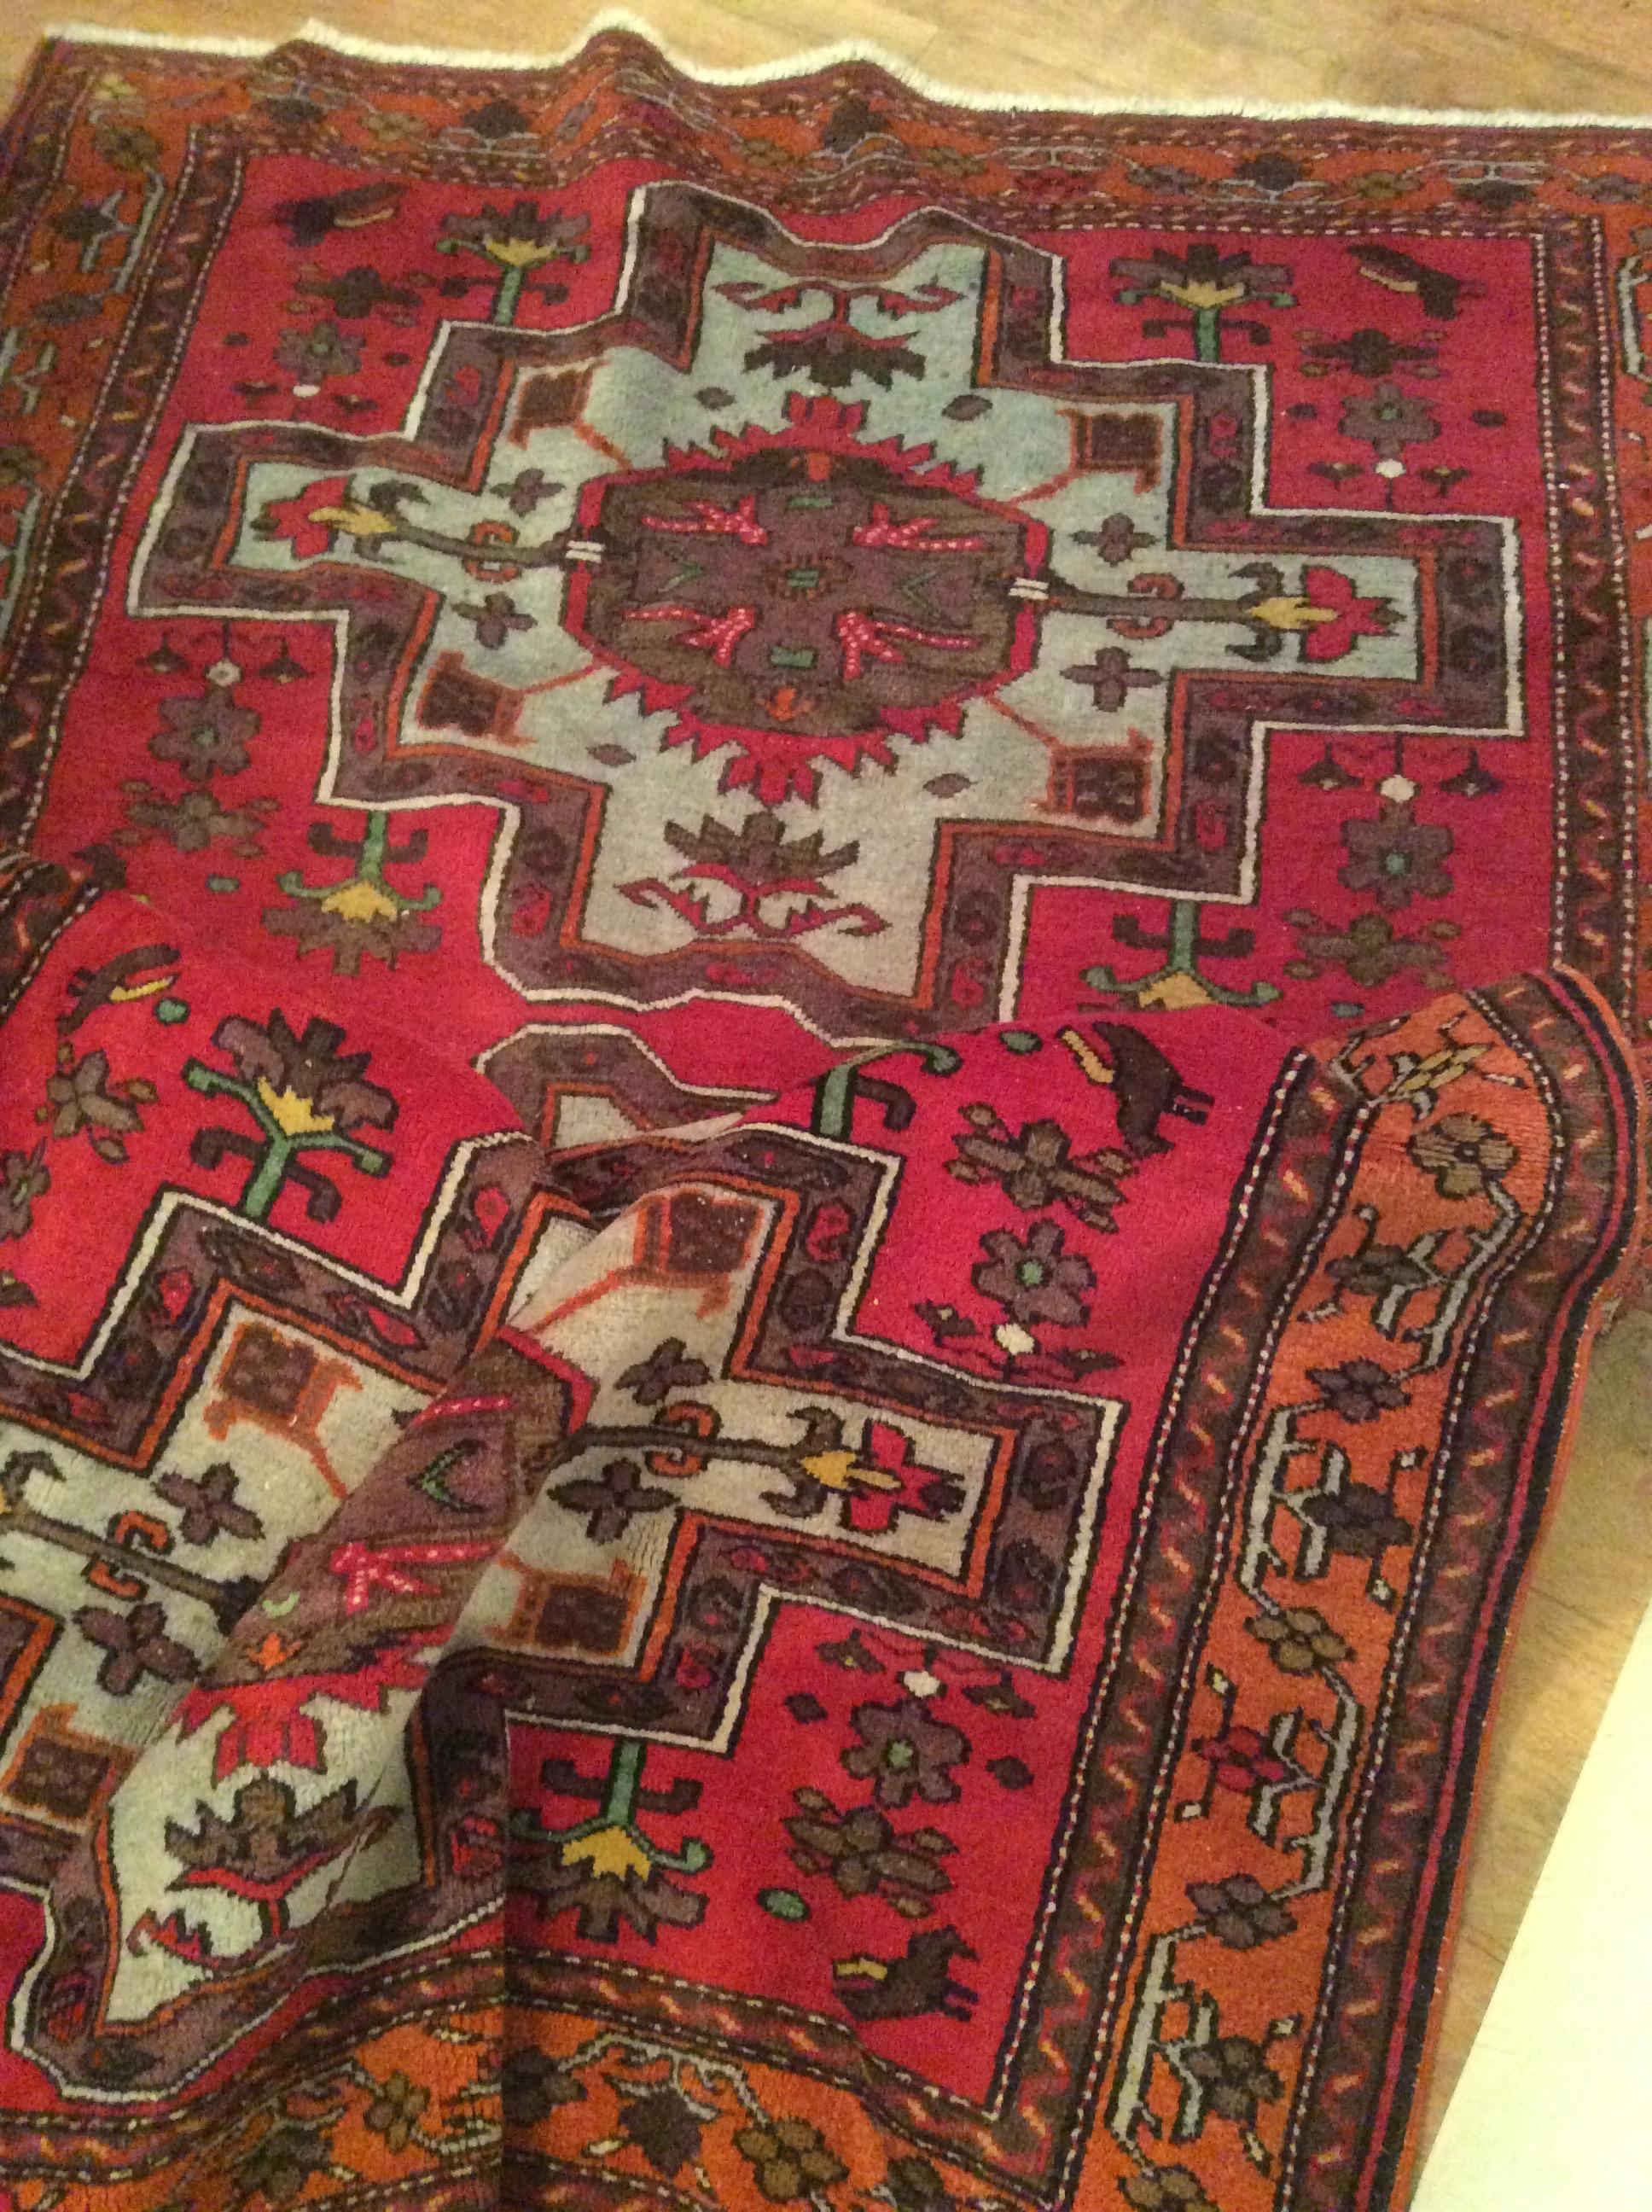 Lot 424 - Good caucasian red ground carpet